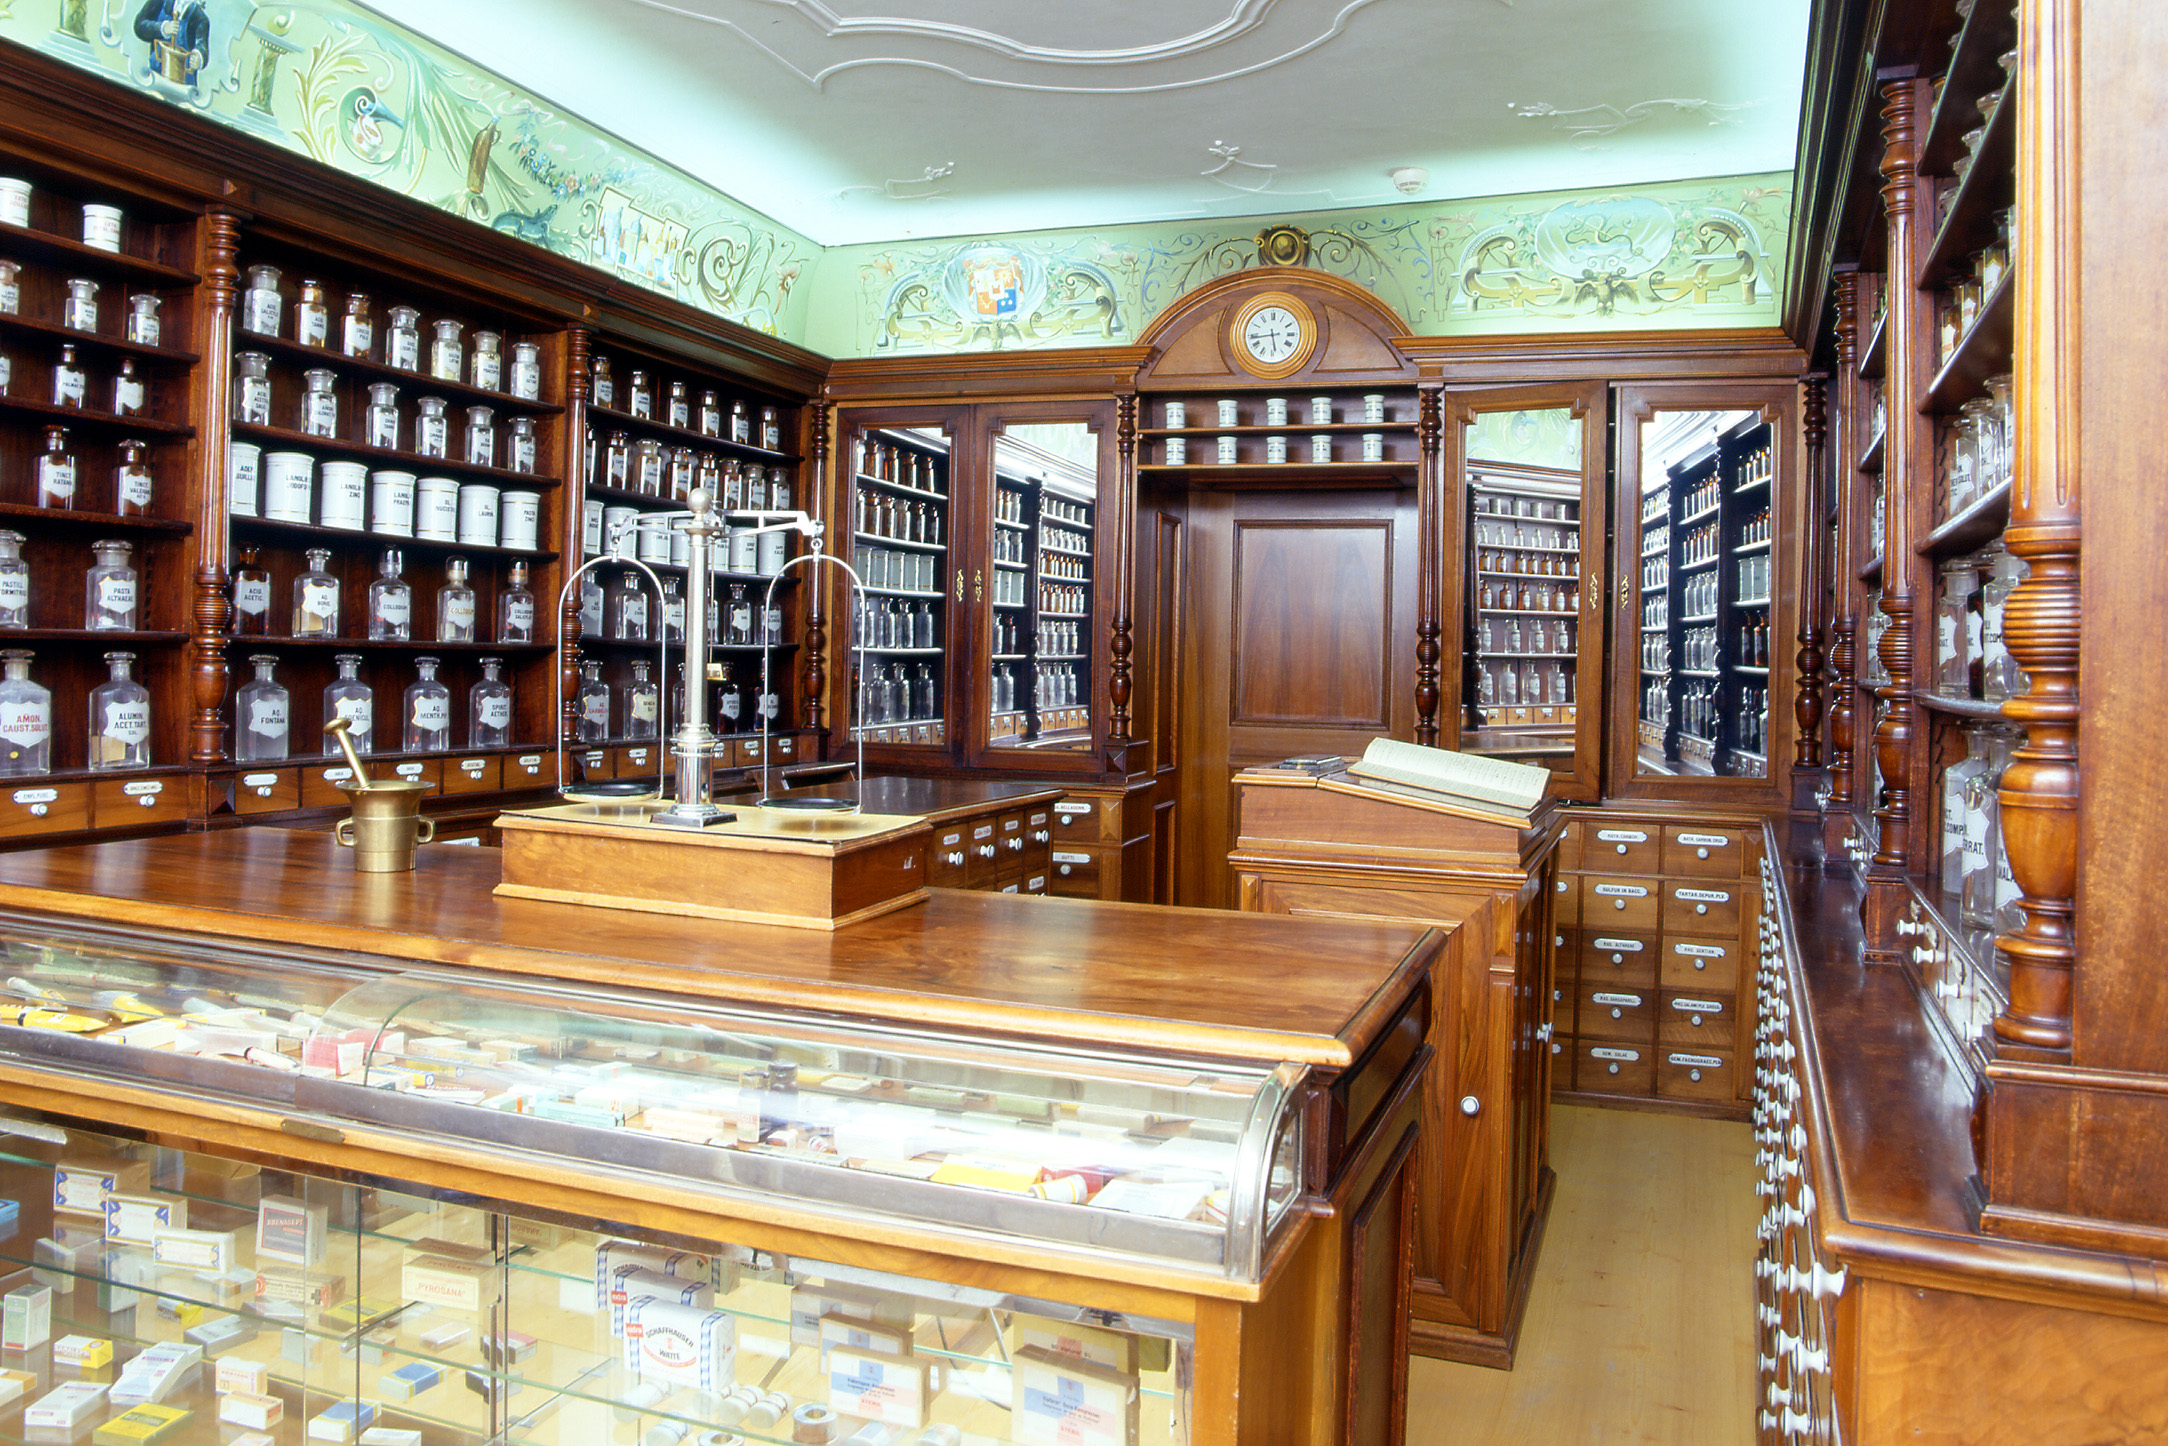 Historisches Museum, Bischofszell